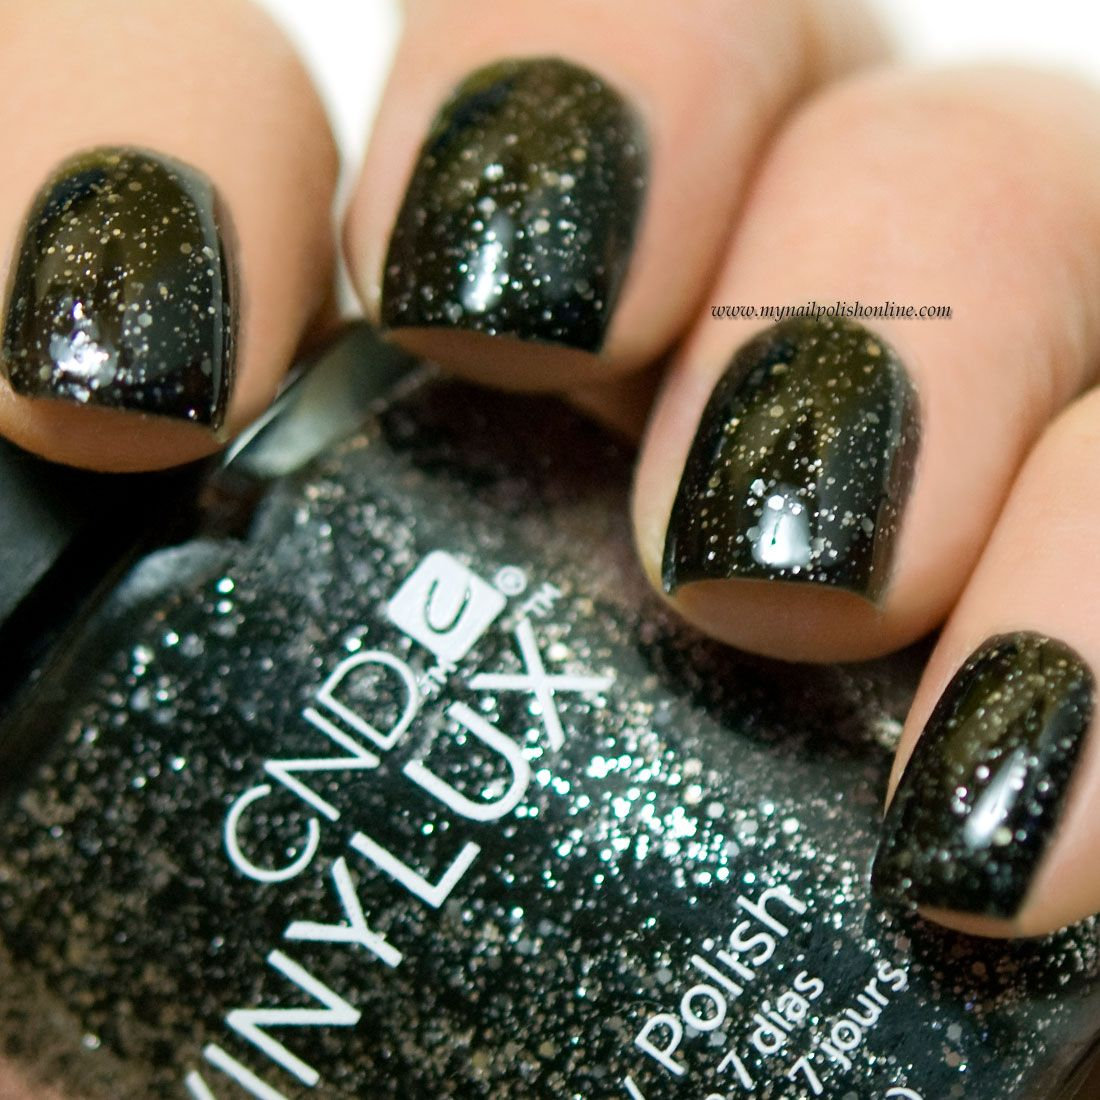 CND Vinylux - Dark Diamonds   Cnd vinylux, Nail polish online and ...